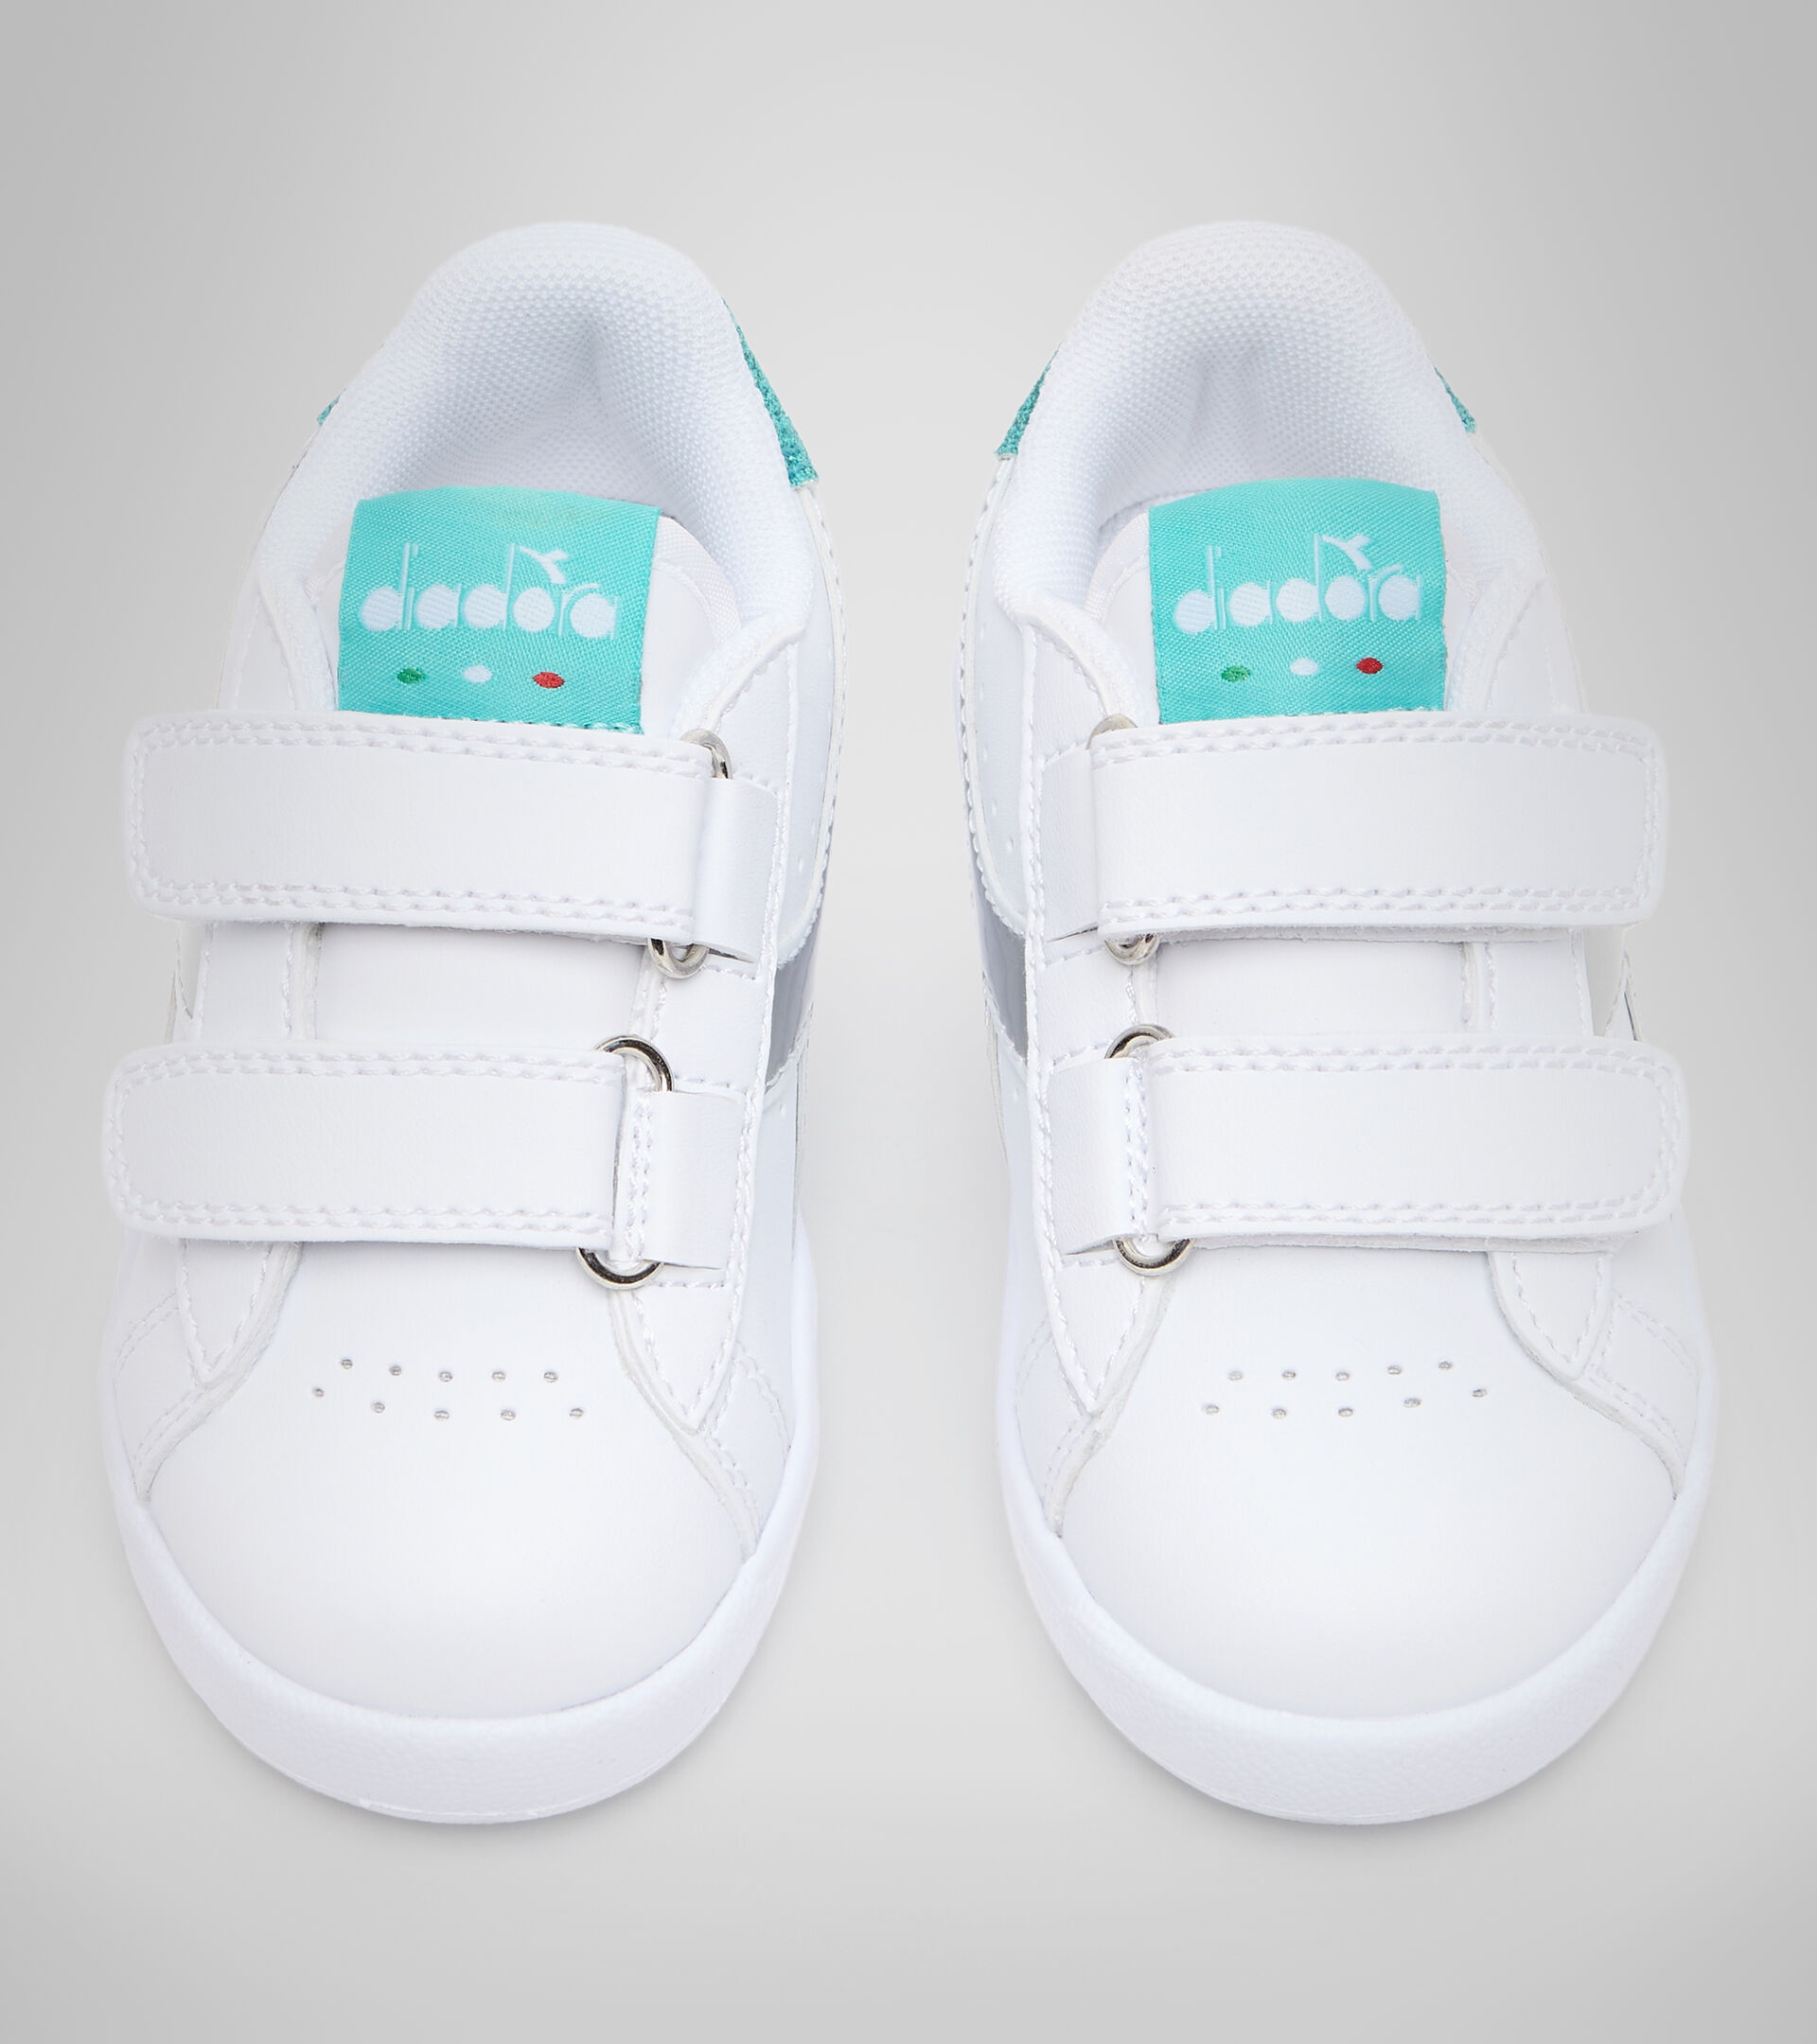 Chaussures de sport - Bambins 1-4 ans GAME P TD GIRL BLANC/BLEU TURQUOISE - Diadora